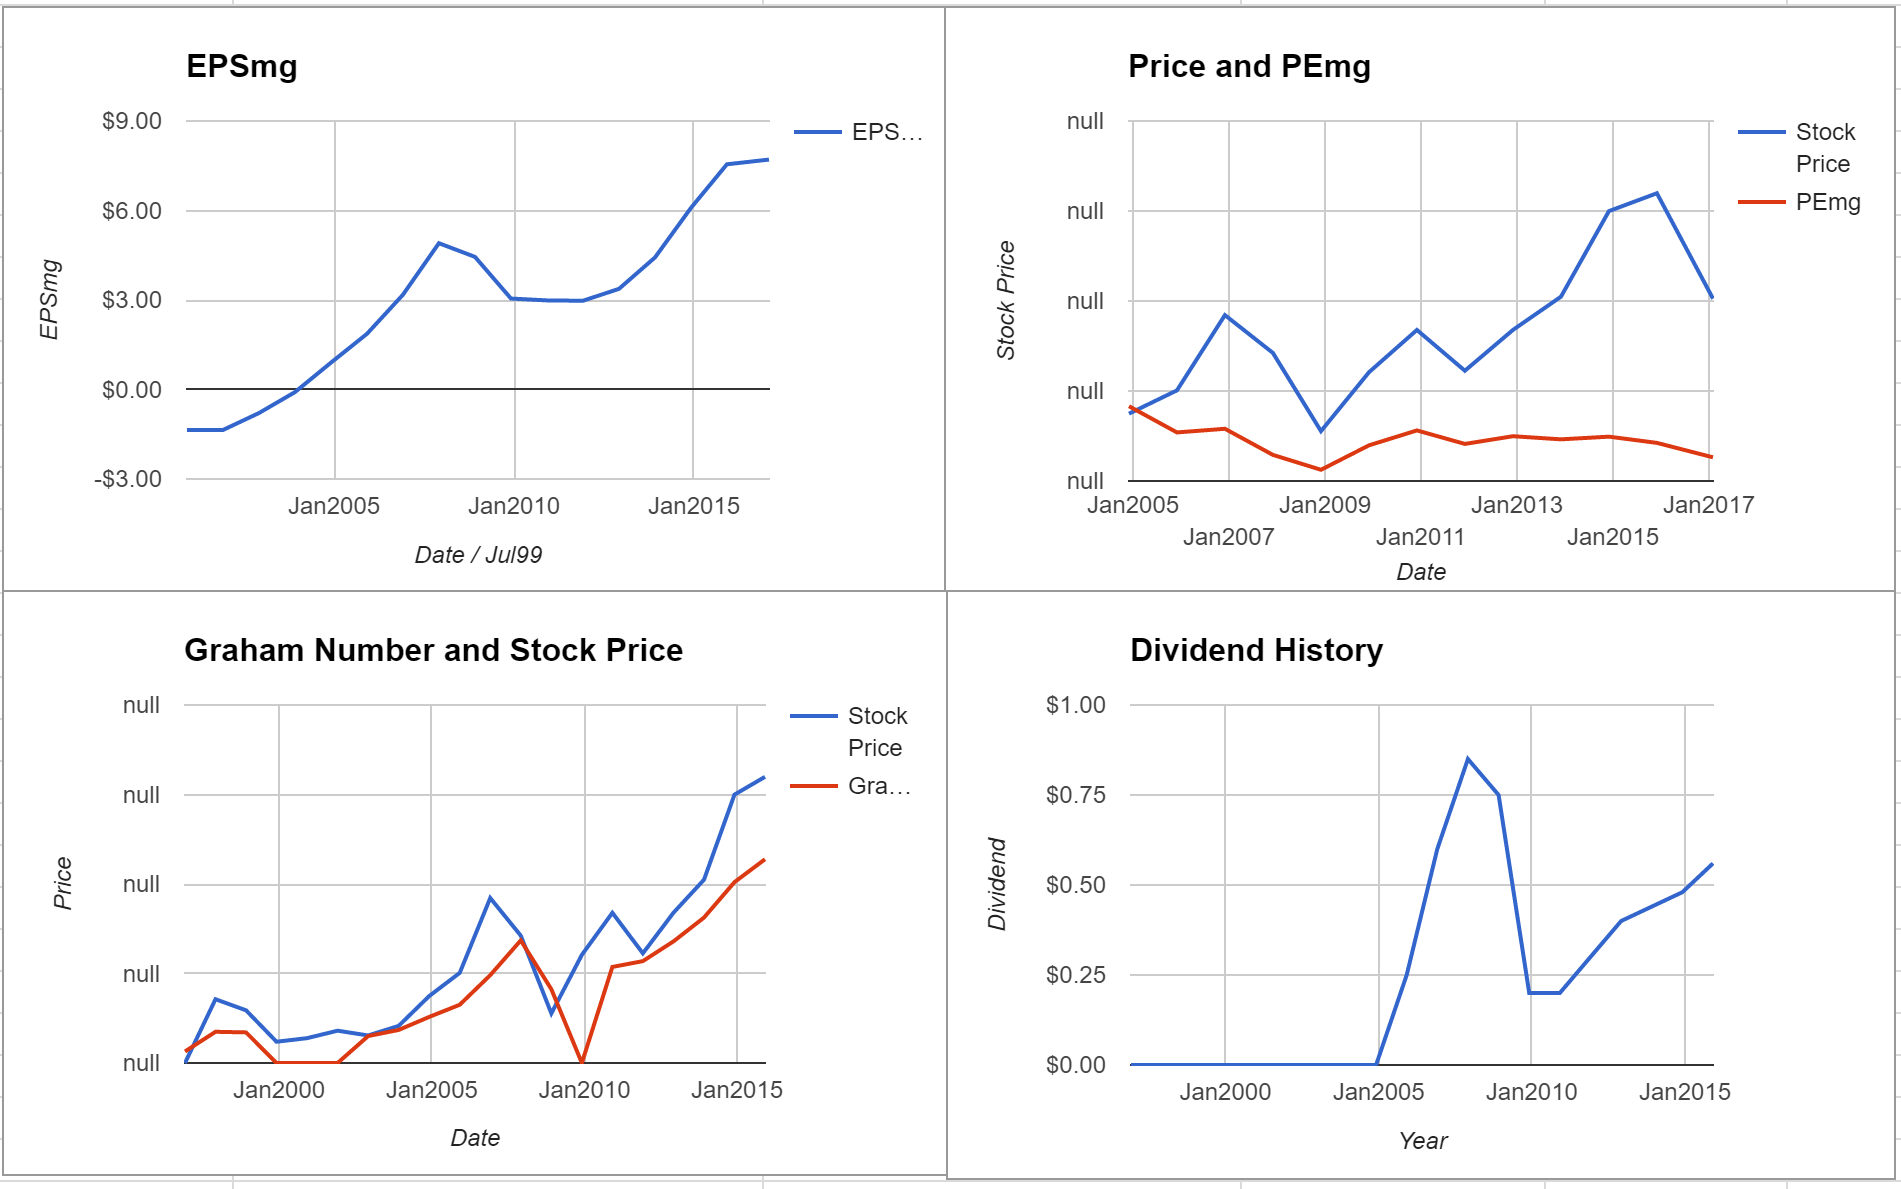 Jones Lang LaSalle Inc Valuation – Initial Coverage $JLL